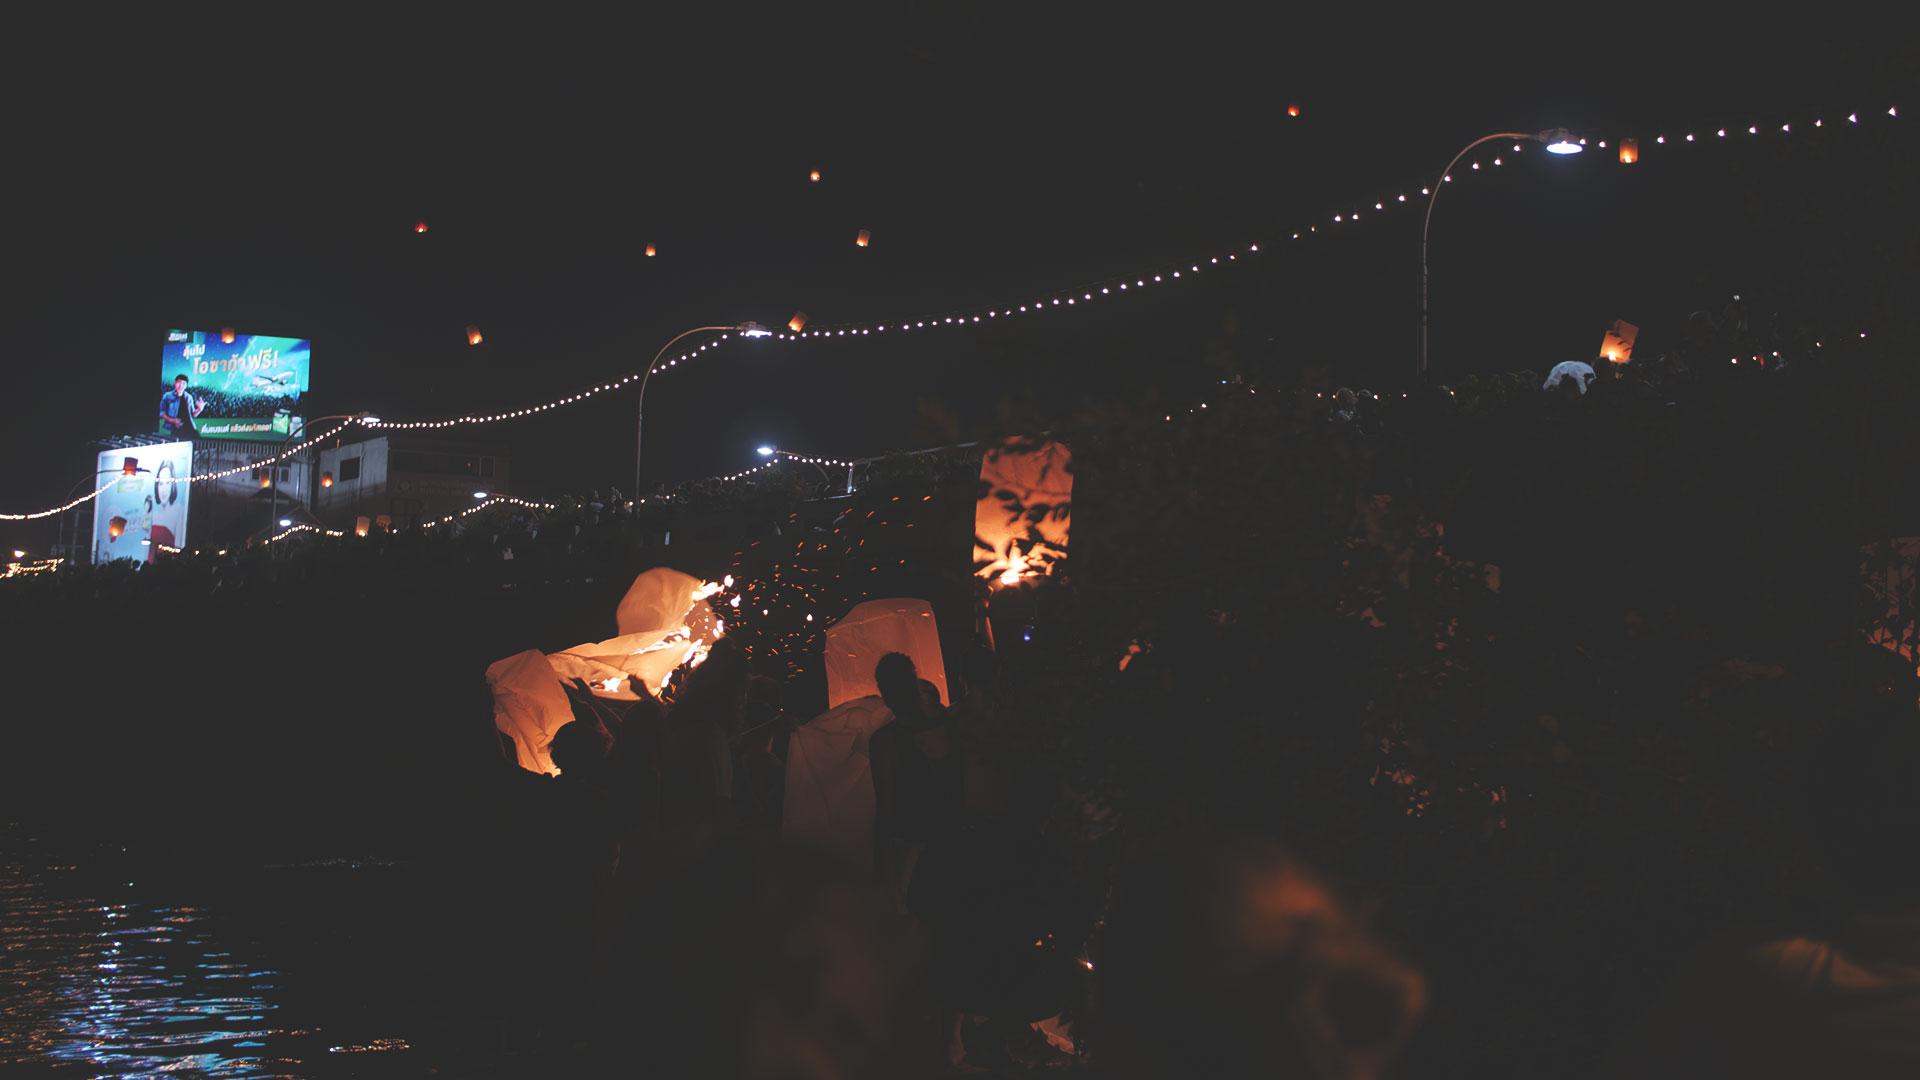 Yee Peng Festival in Chiang Mai - Laterne geht am Steg neben der Nawarat Bridge in Flammen auf